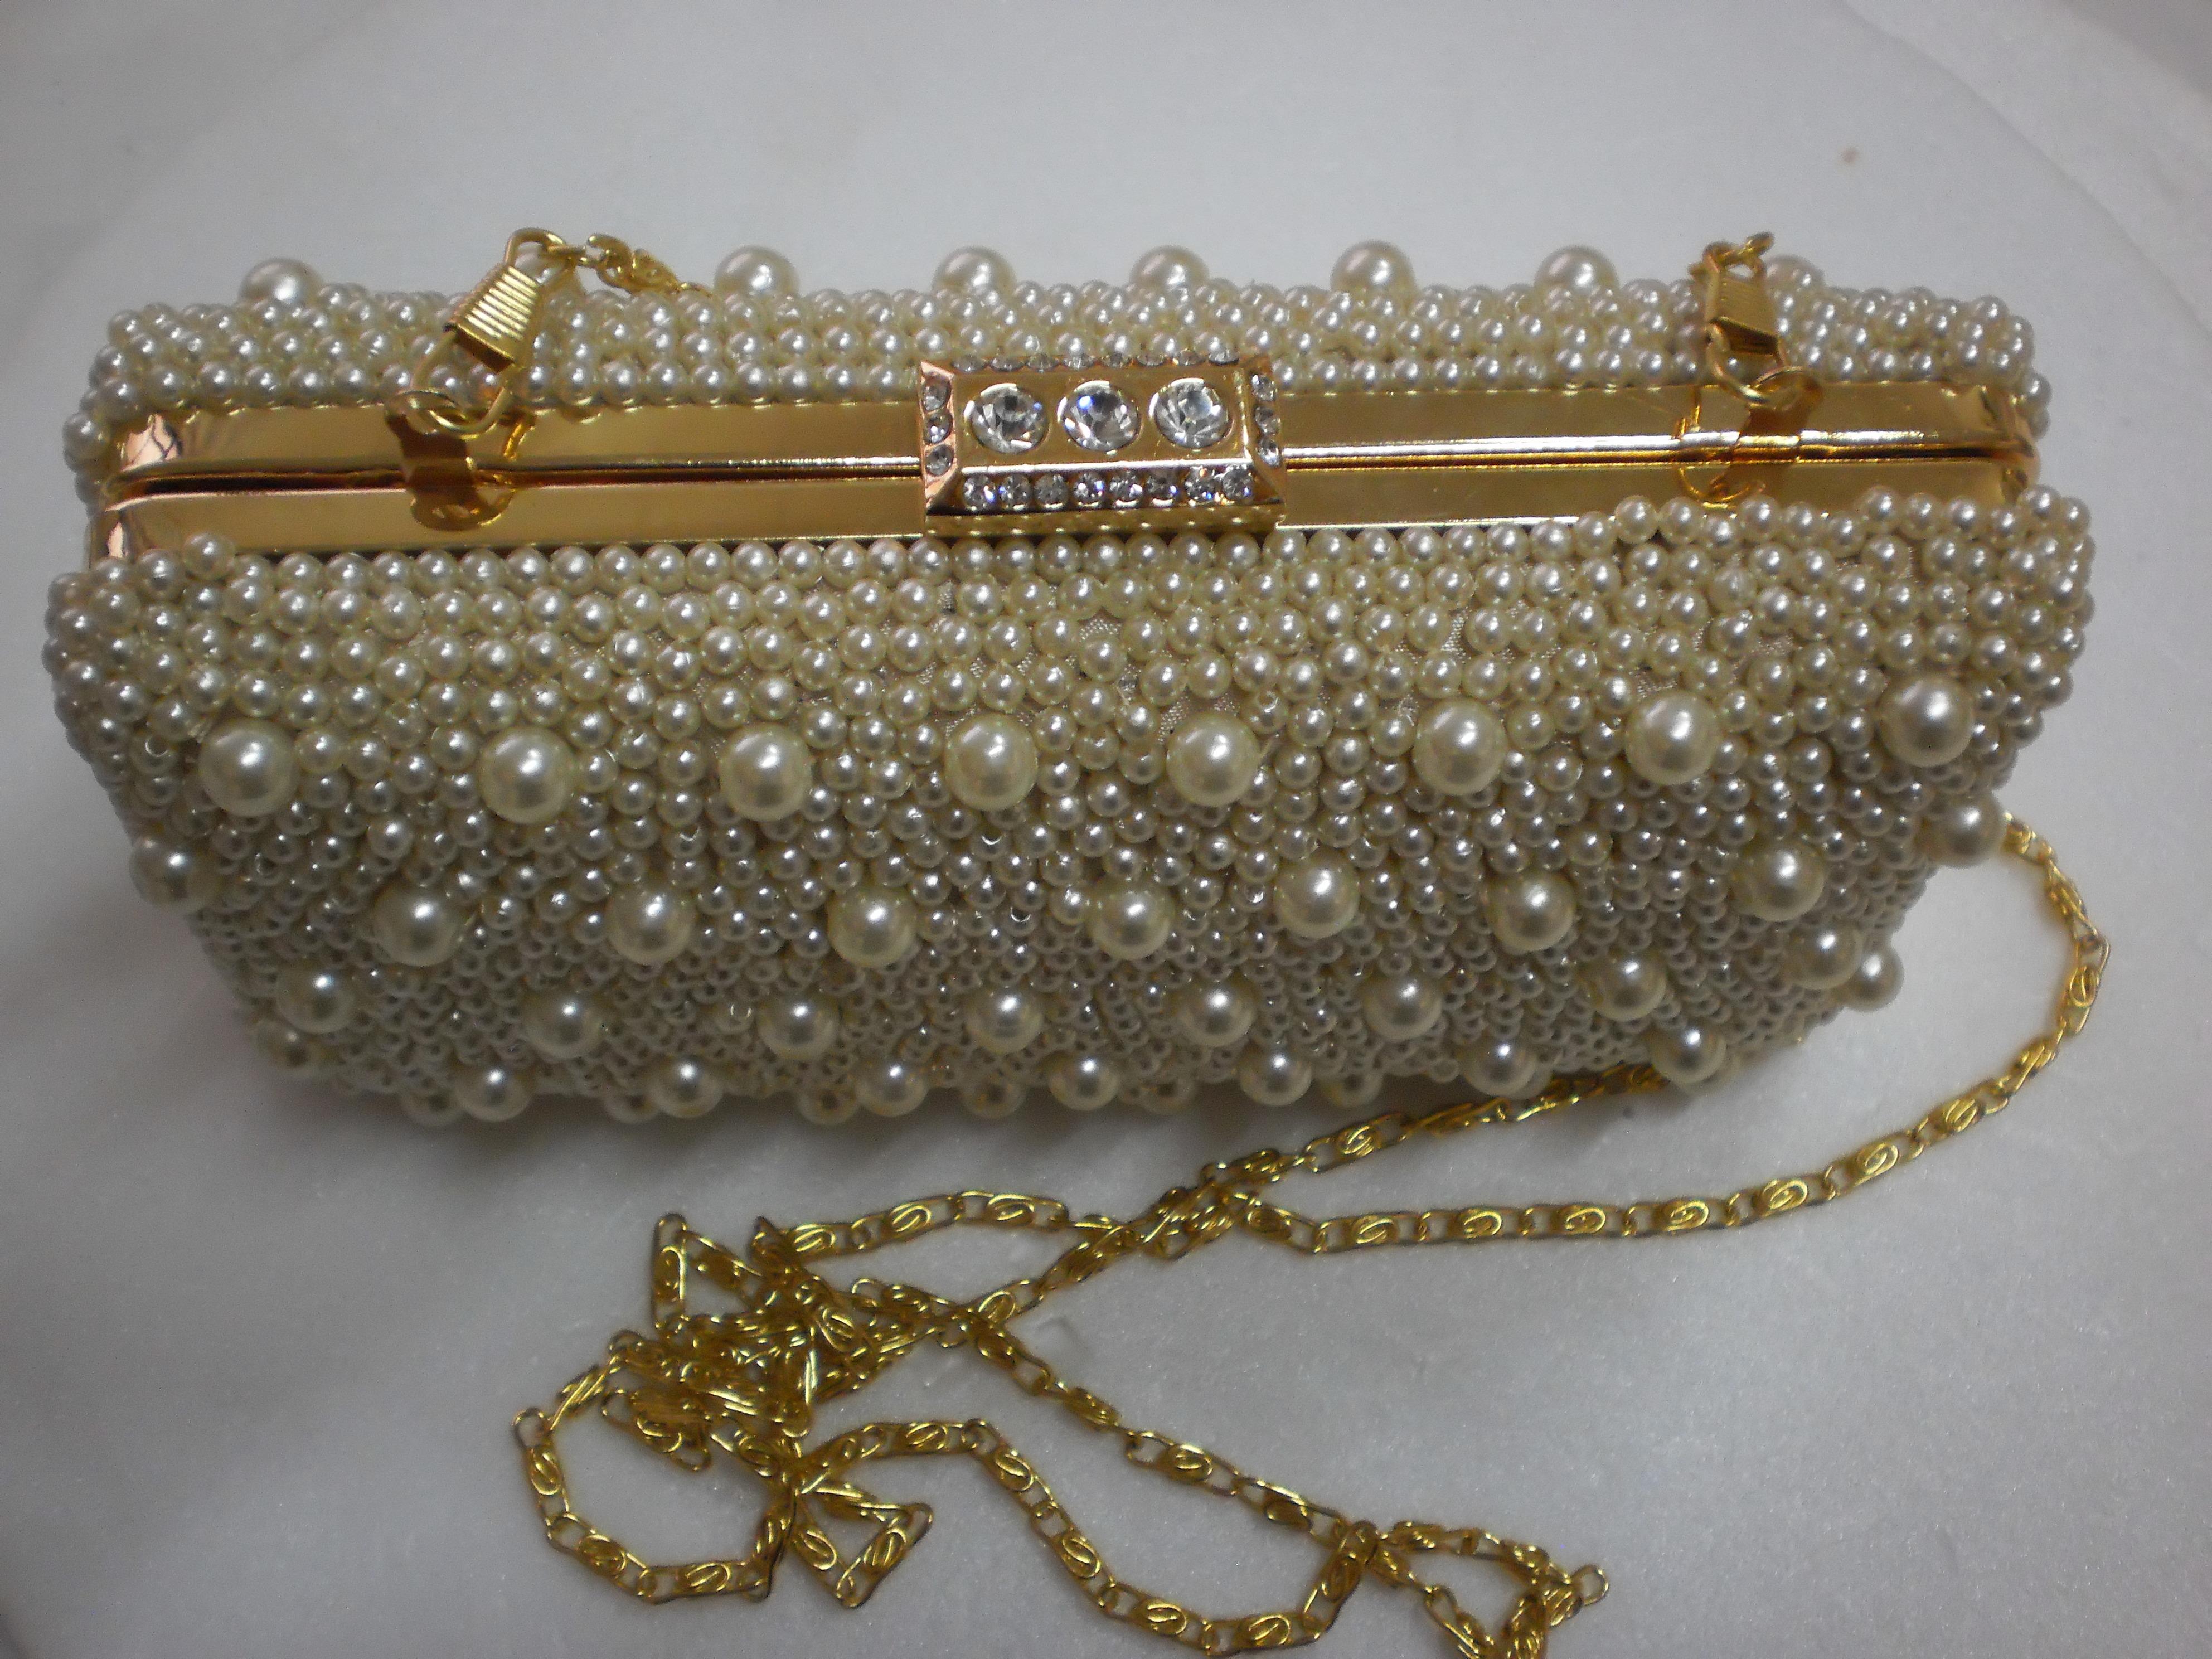 Bolsa De Festa Tipo Carteira : Bolsa ou carteira para festa eventos by maria antonia elo